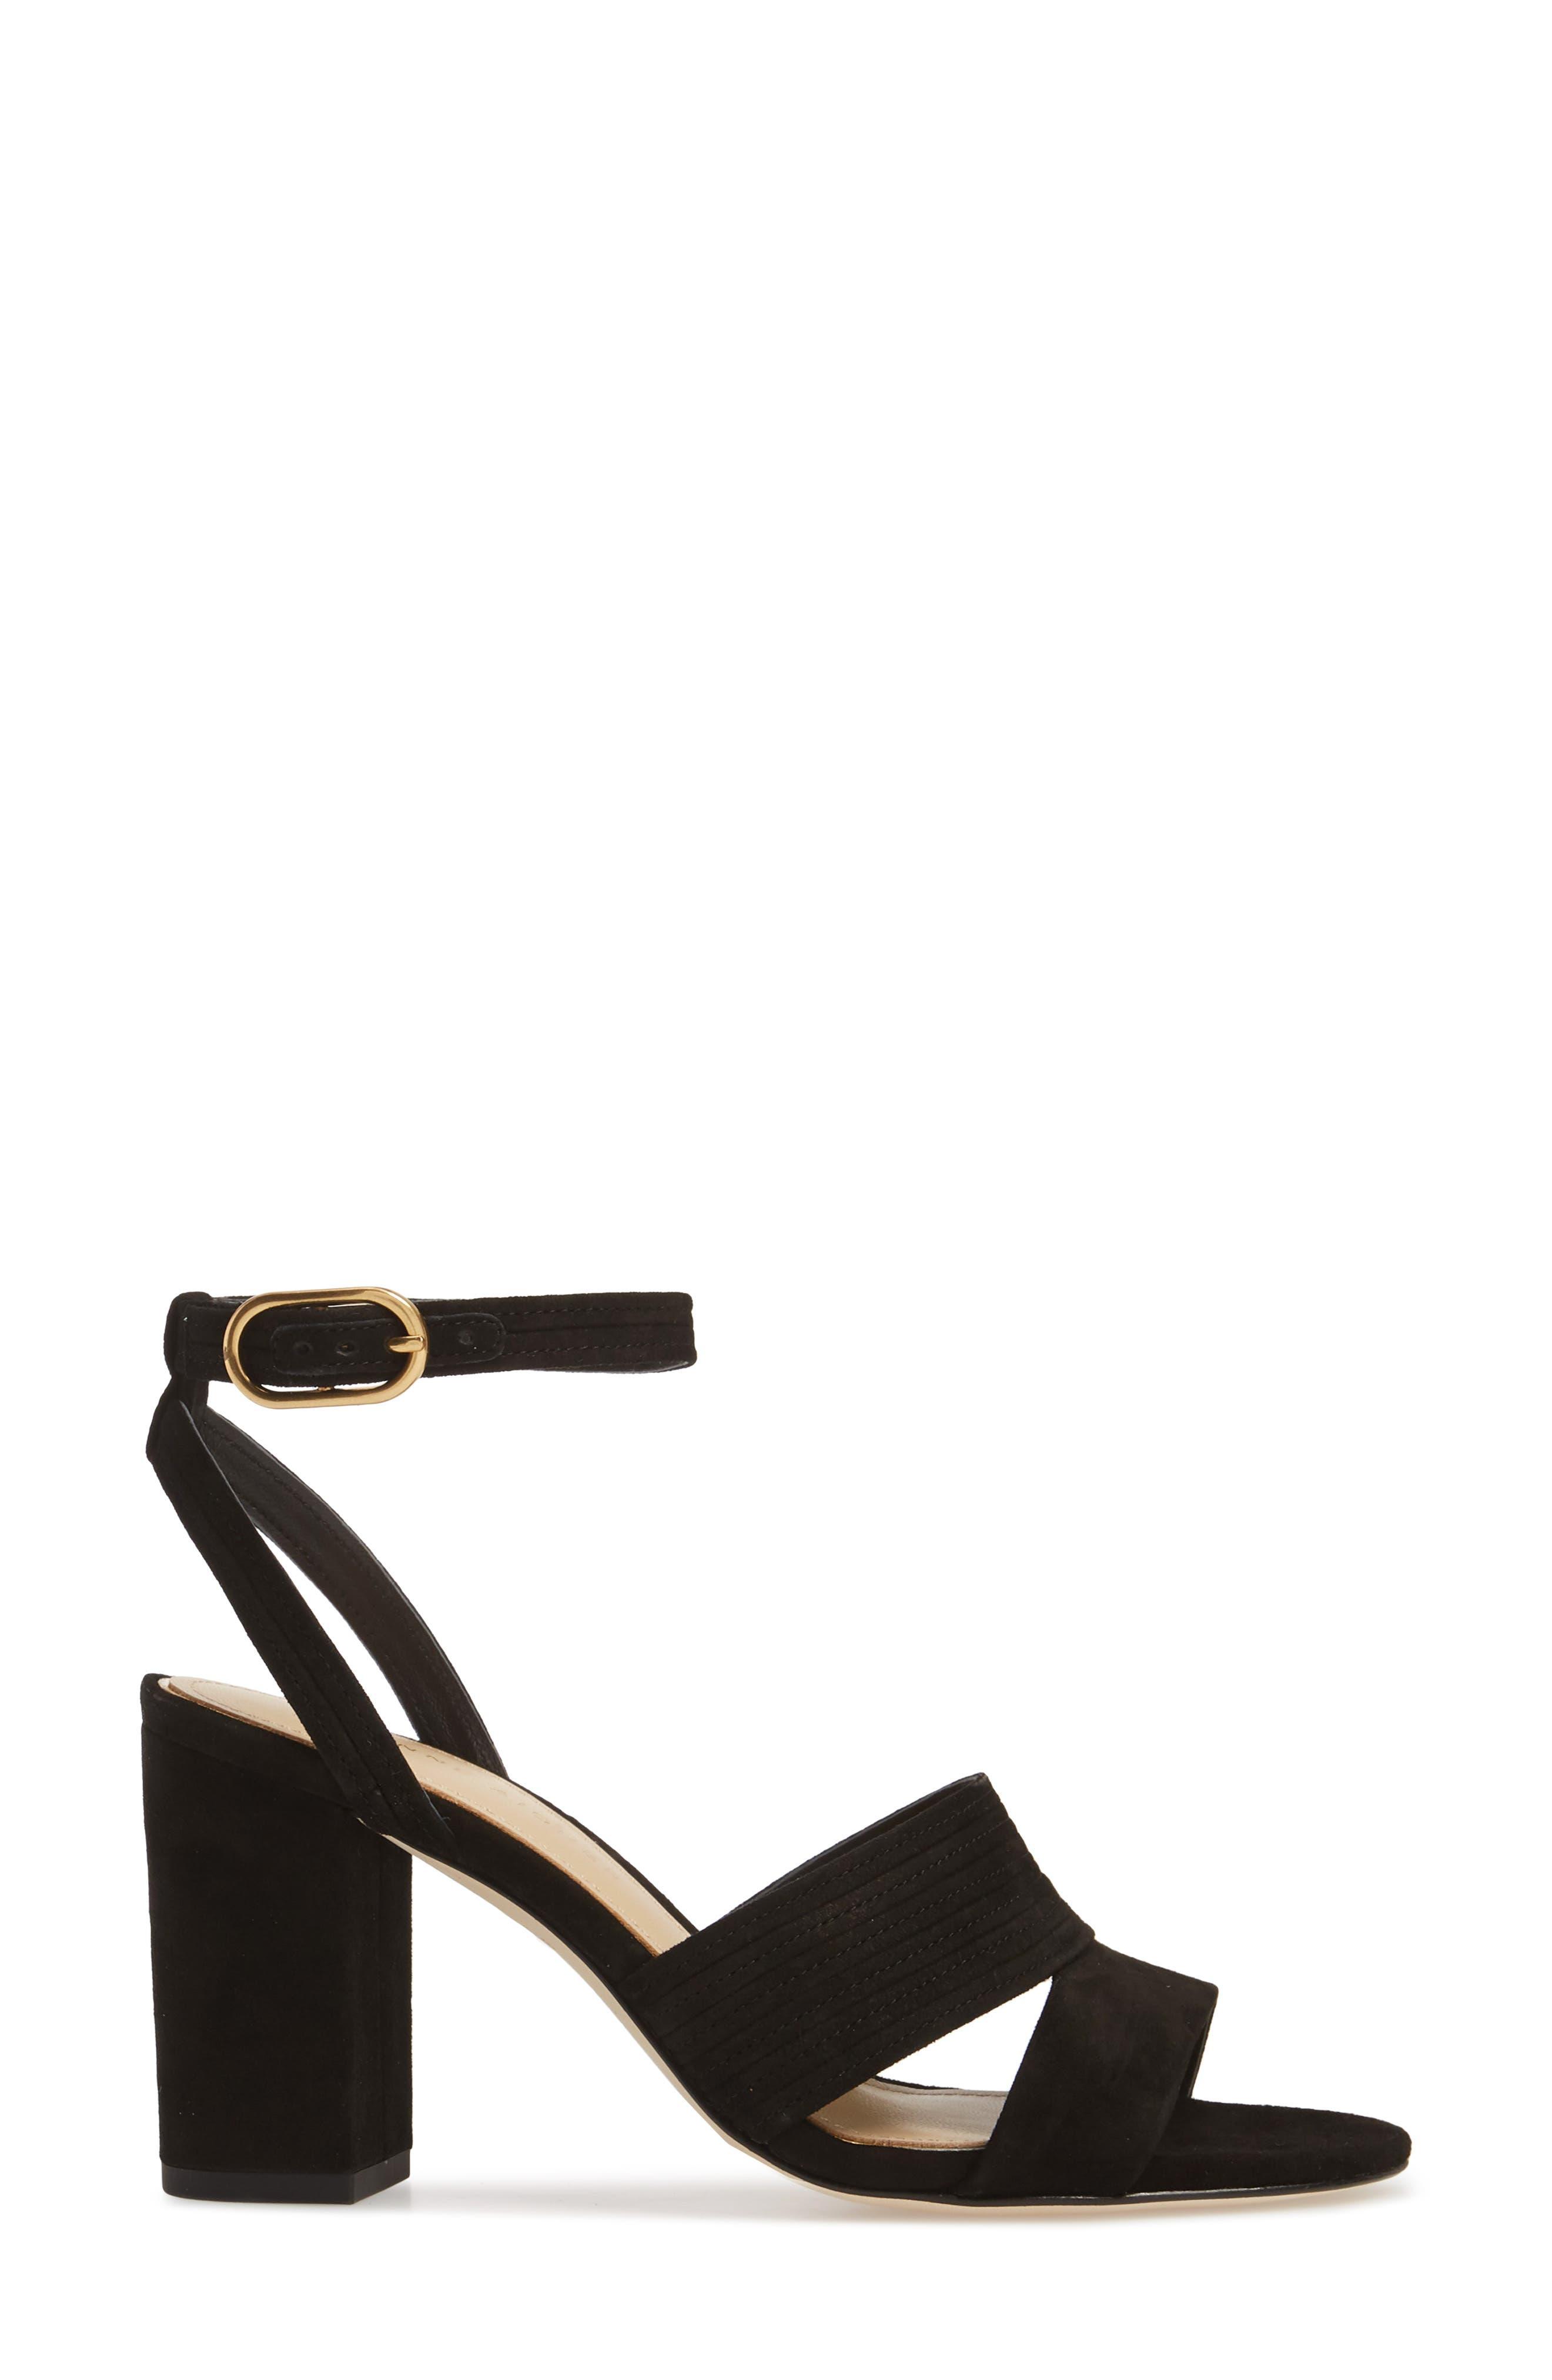 Legend Ankle Strap Sandal,                             Alternate thumbnail 3, color,                             BLACK SUEDE